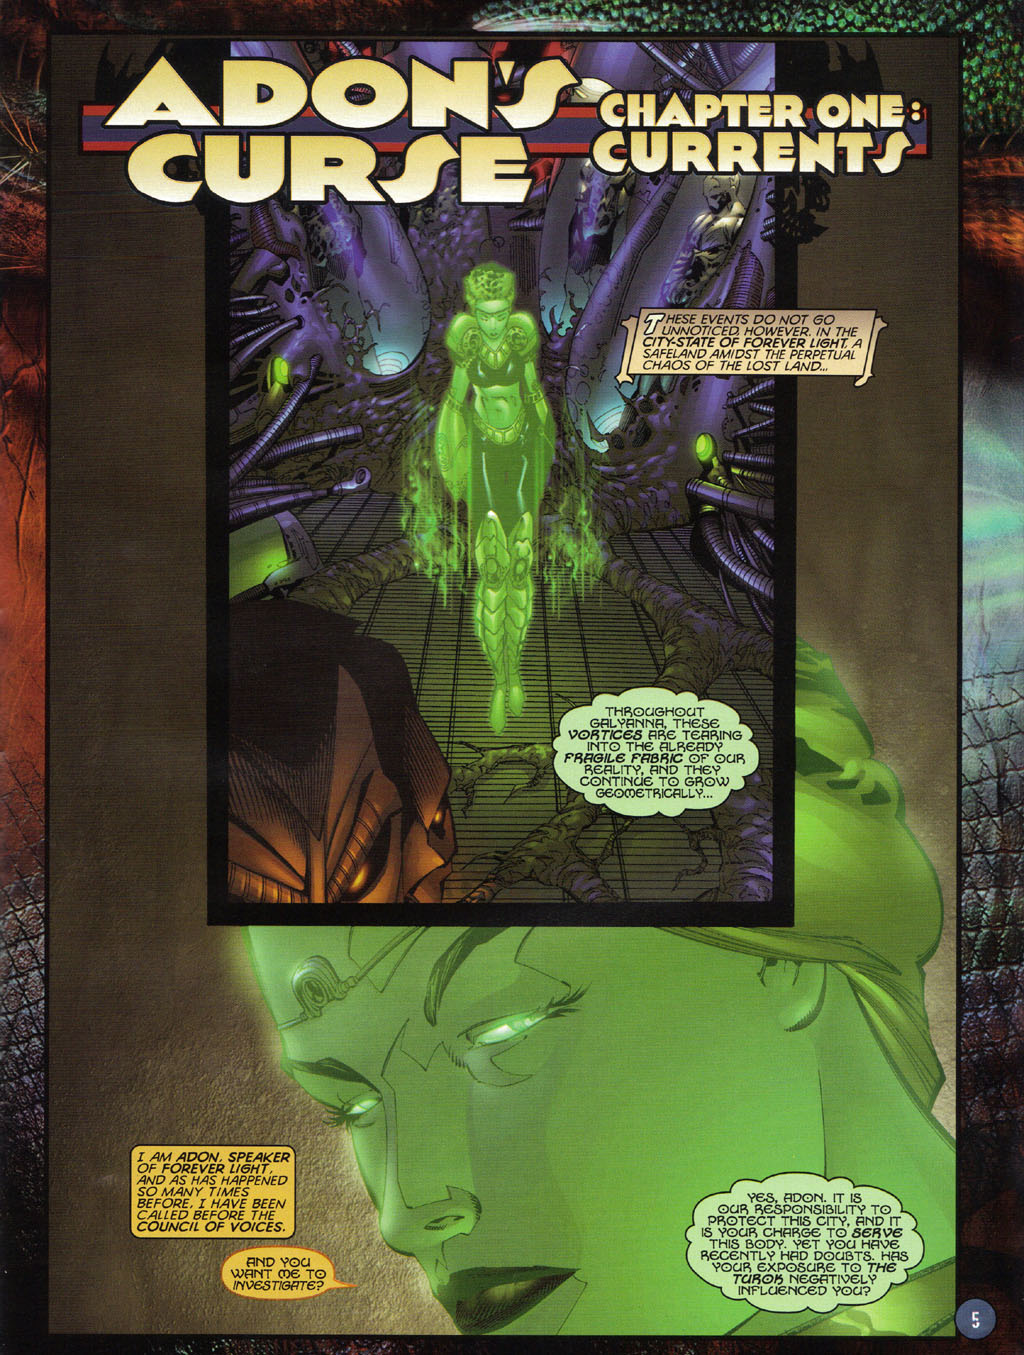 Read online Turok 2: Adon's Curse comic -  Issue # Full - 6